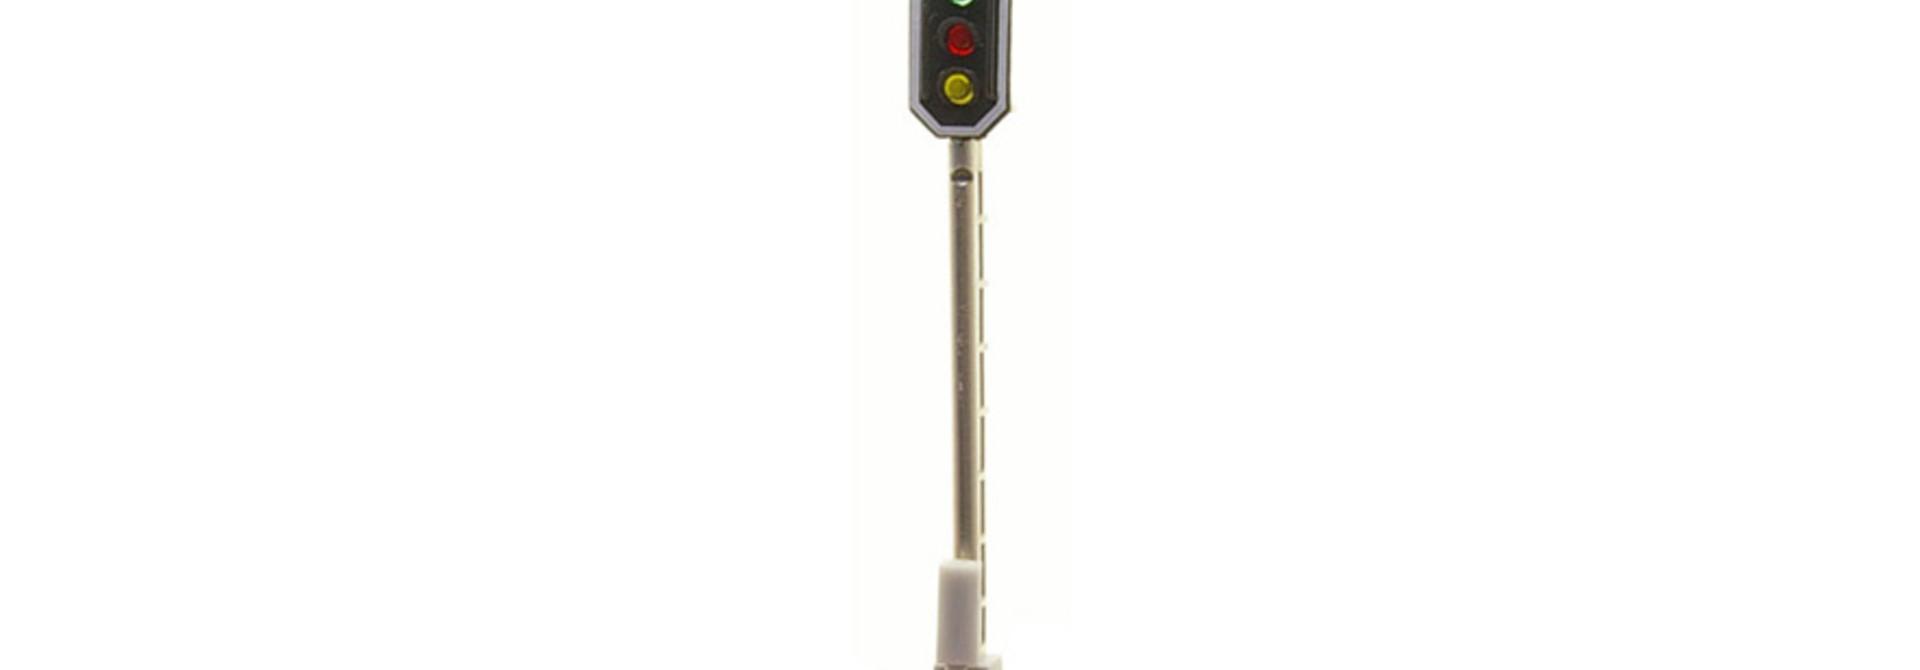 4171100 RhB Licht-Hauptsignal 3 LED